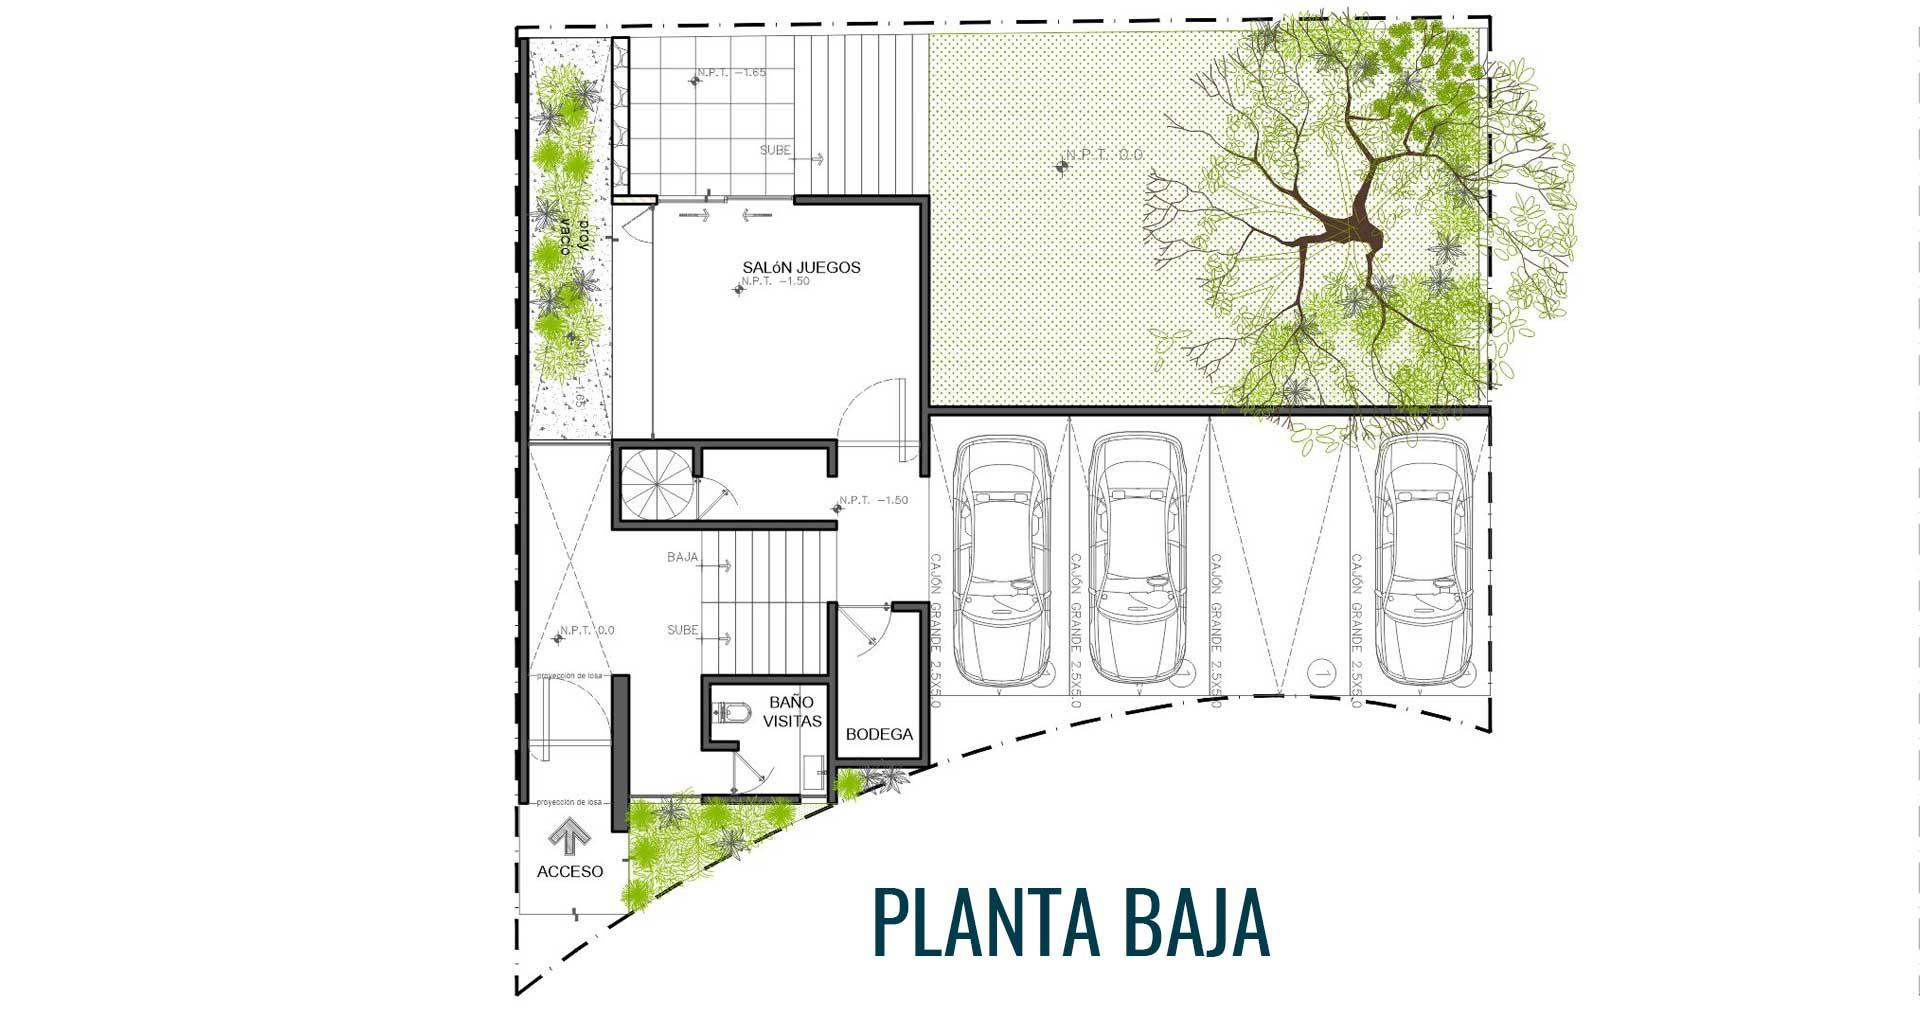 Margaritas 339 residencial Mexihom Residencia 3 planta baja